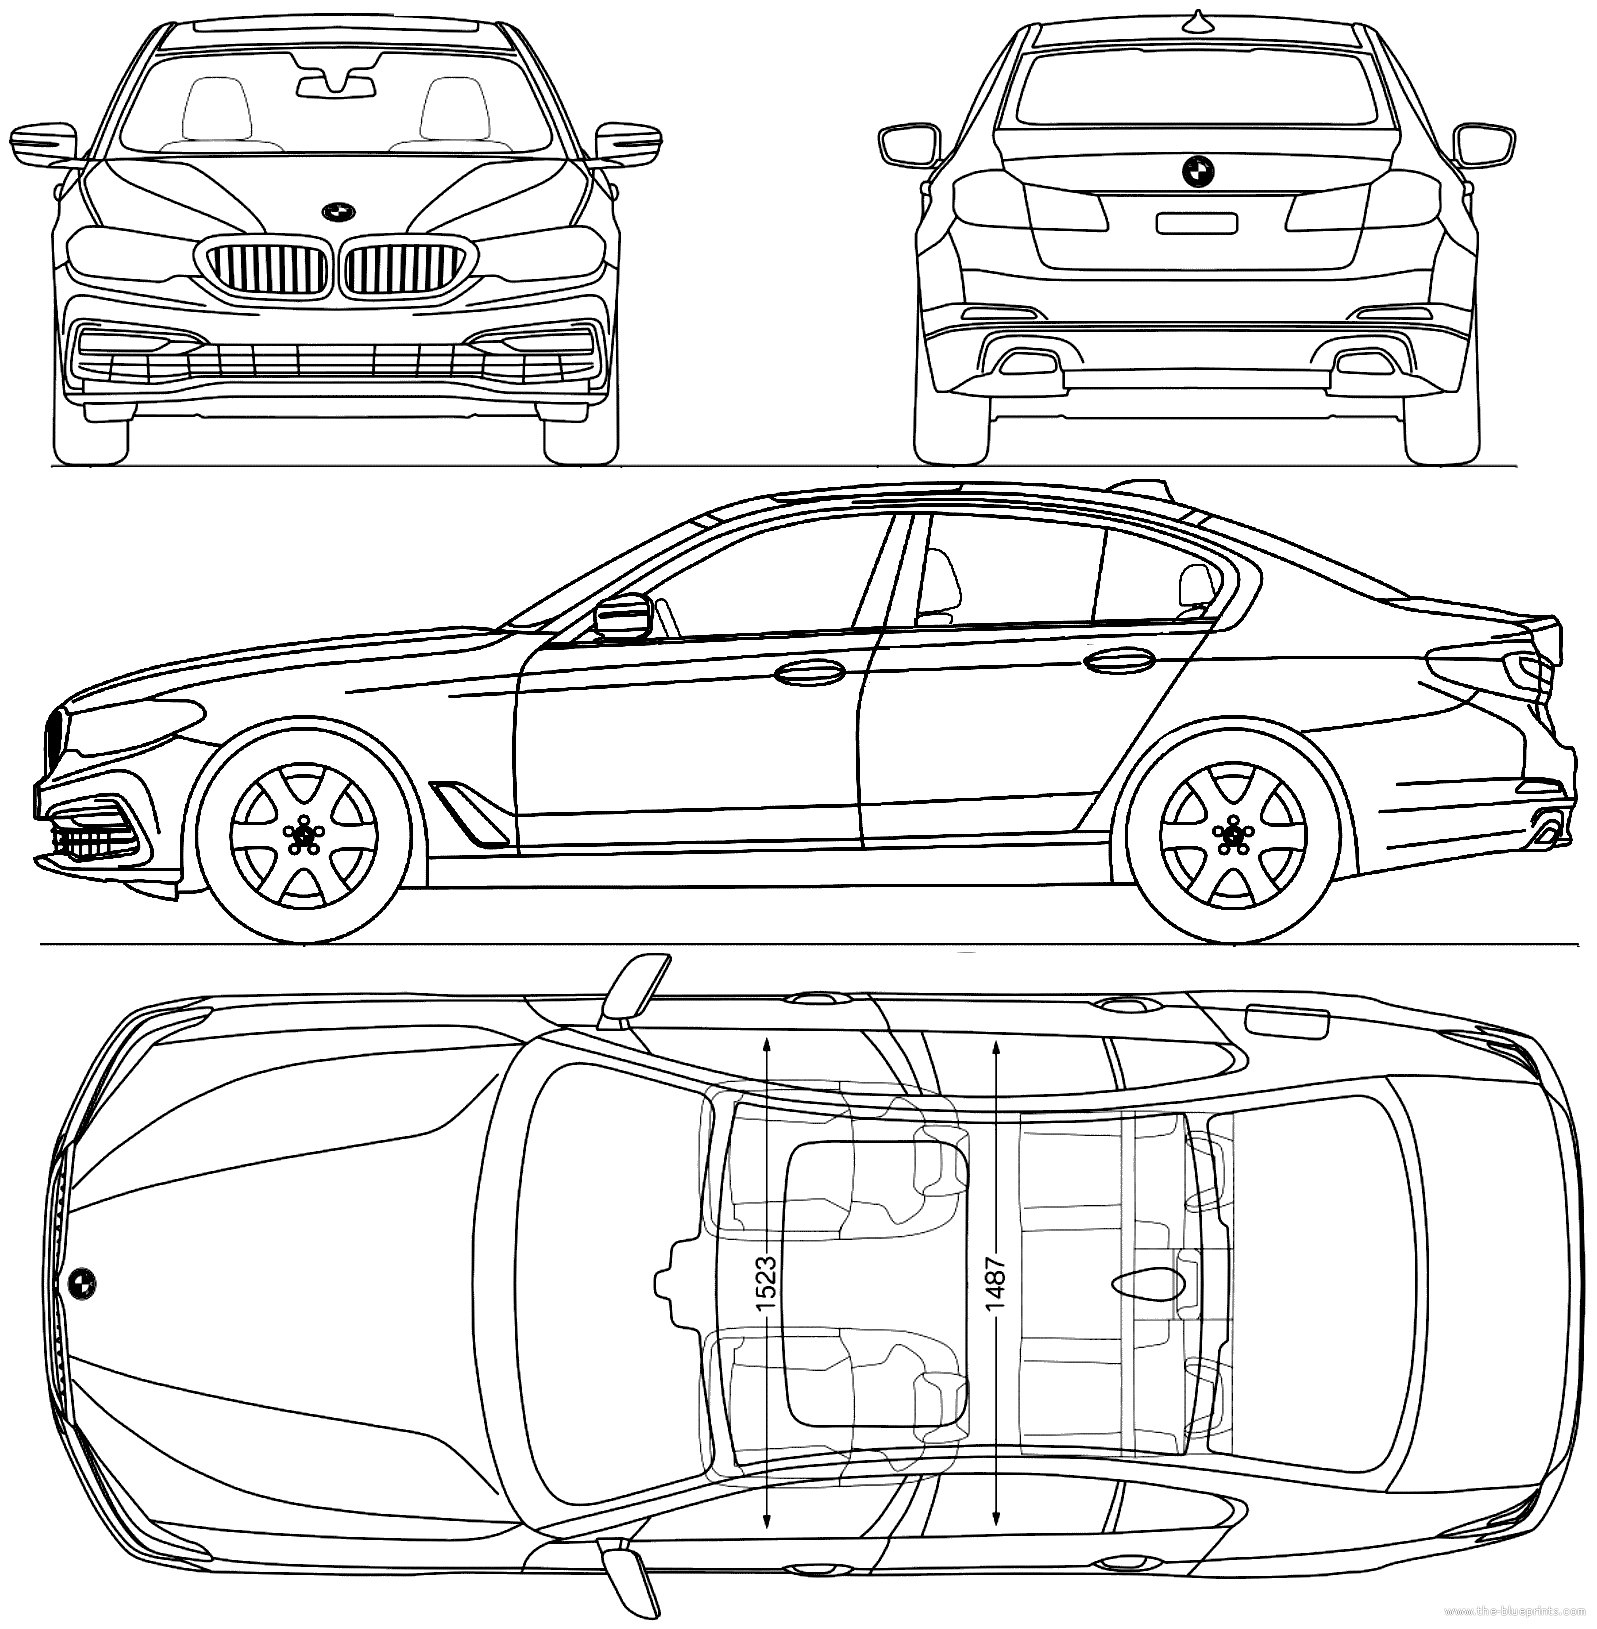 Blueprints Gt Cars Gt Bmw Gt Bmw 5 Series G30 2017